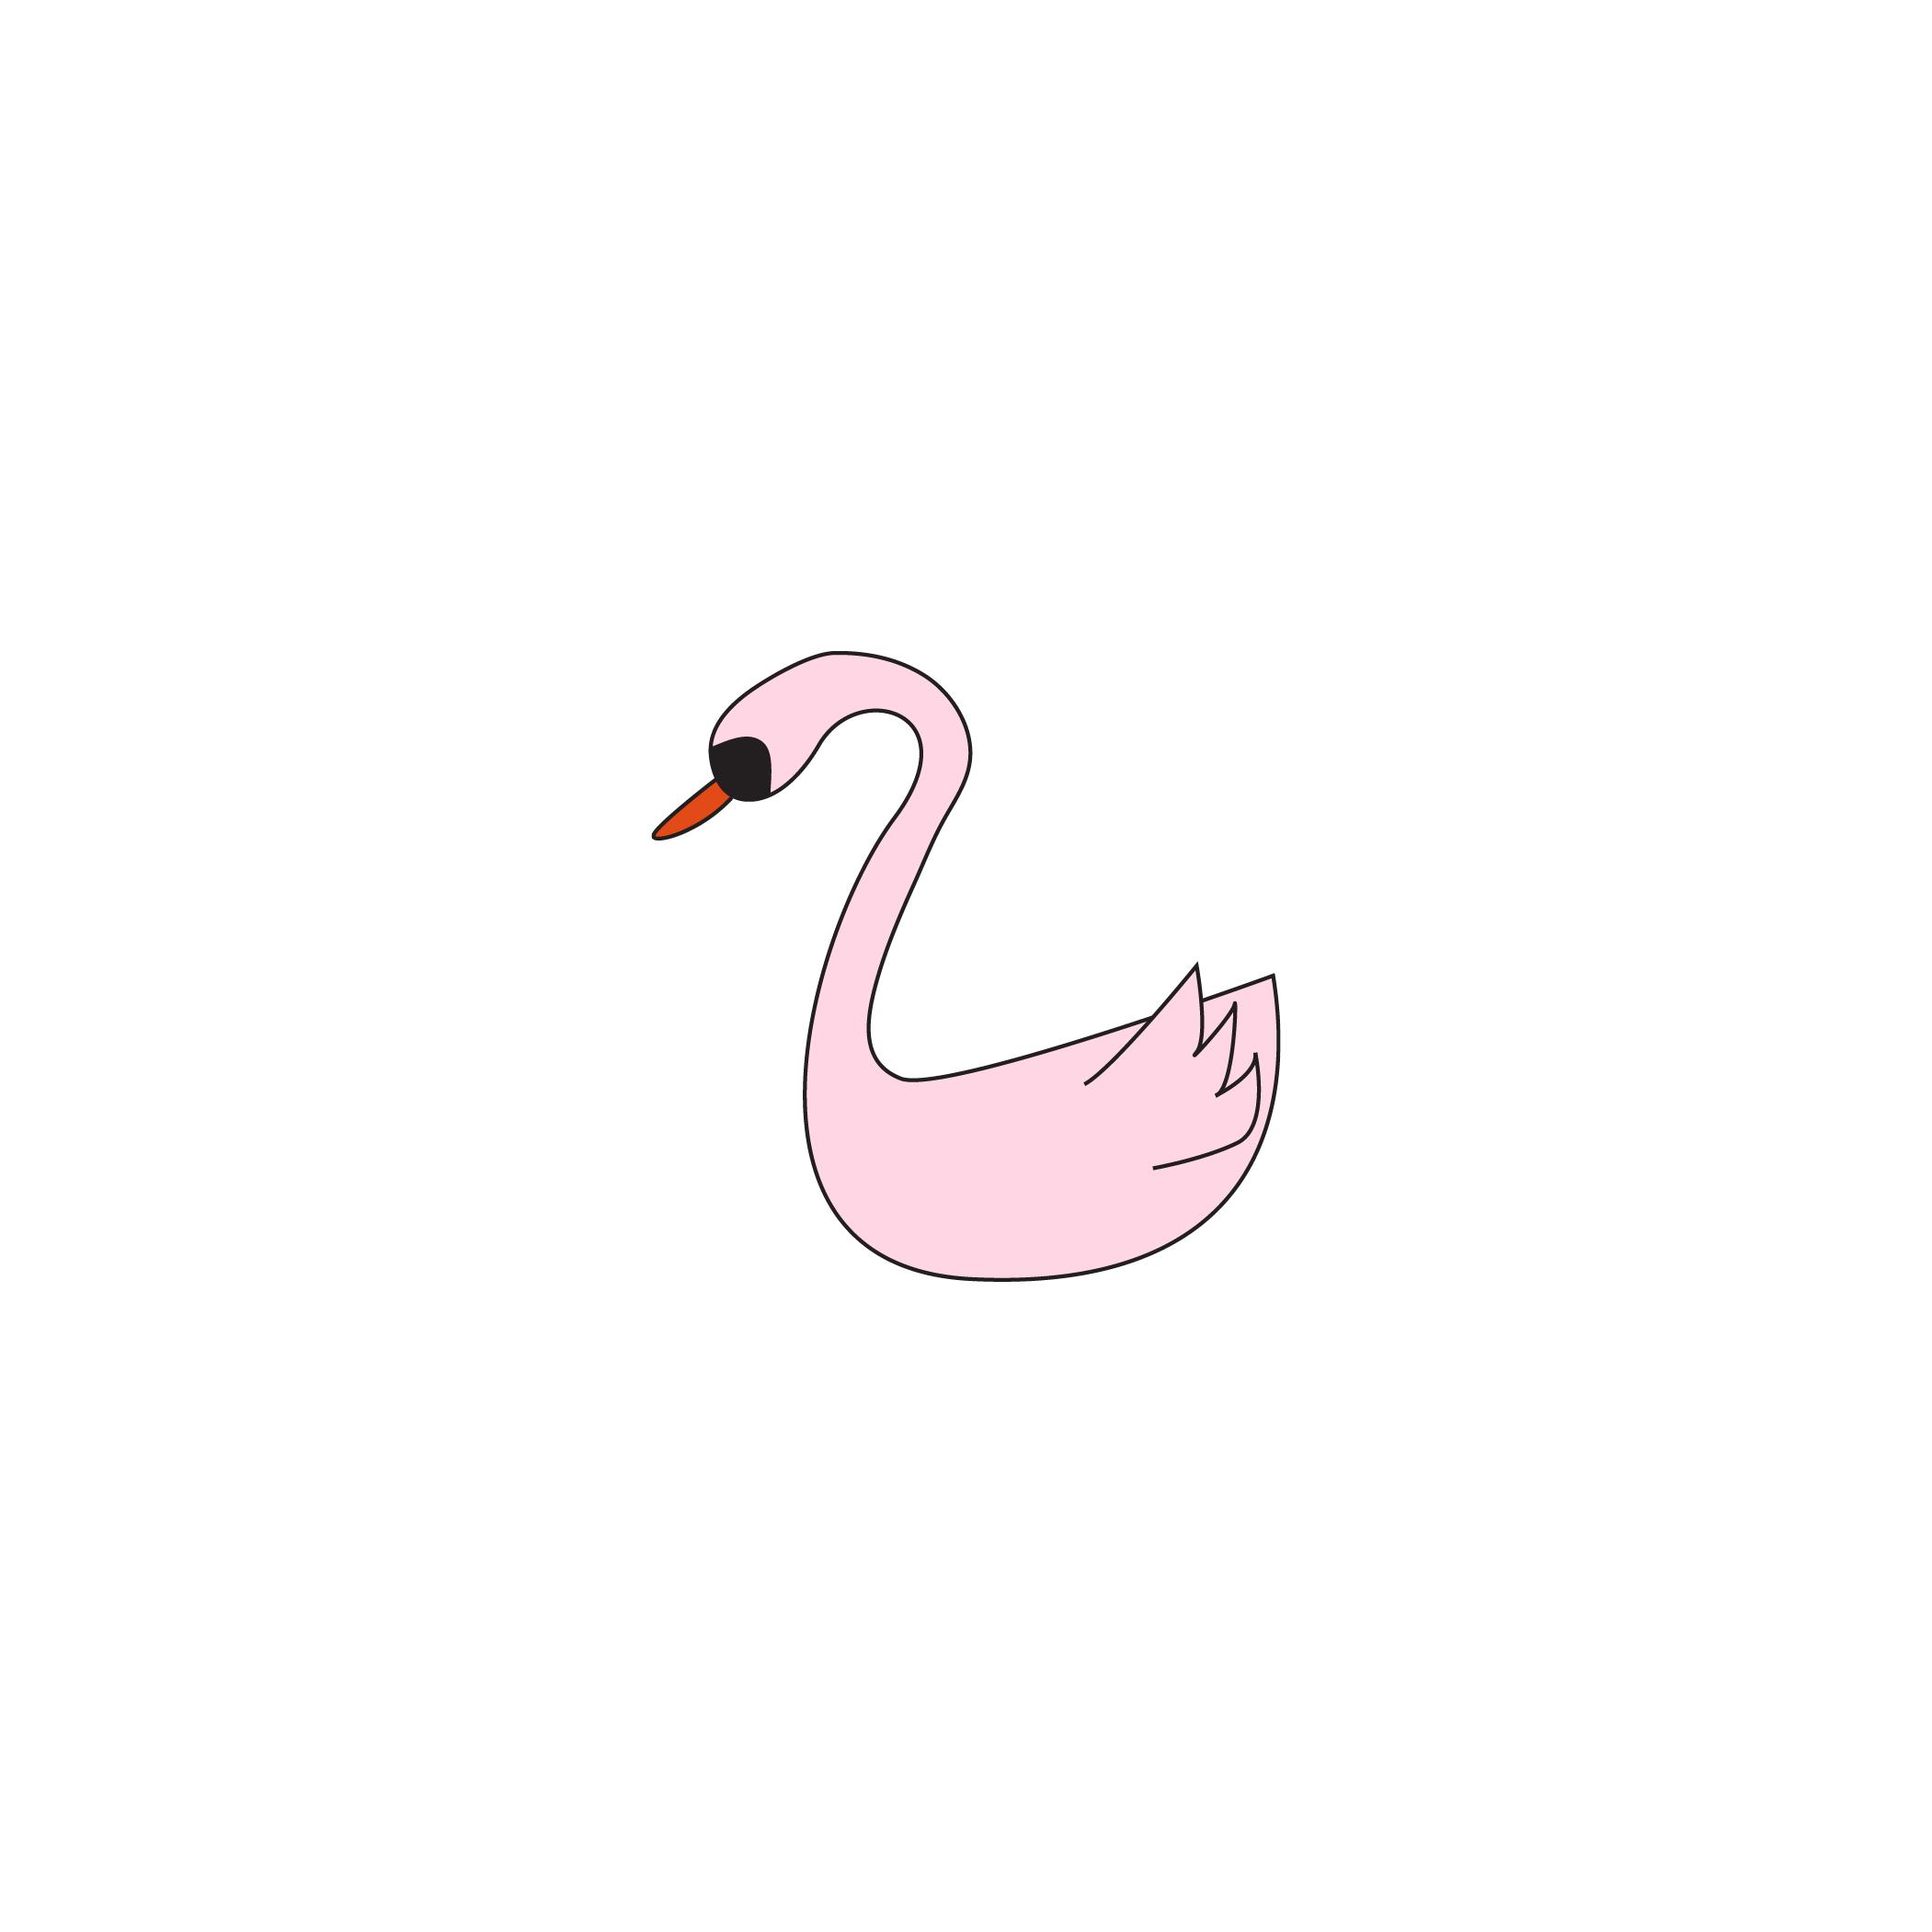 PInk swan_Artboard 2.png